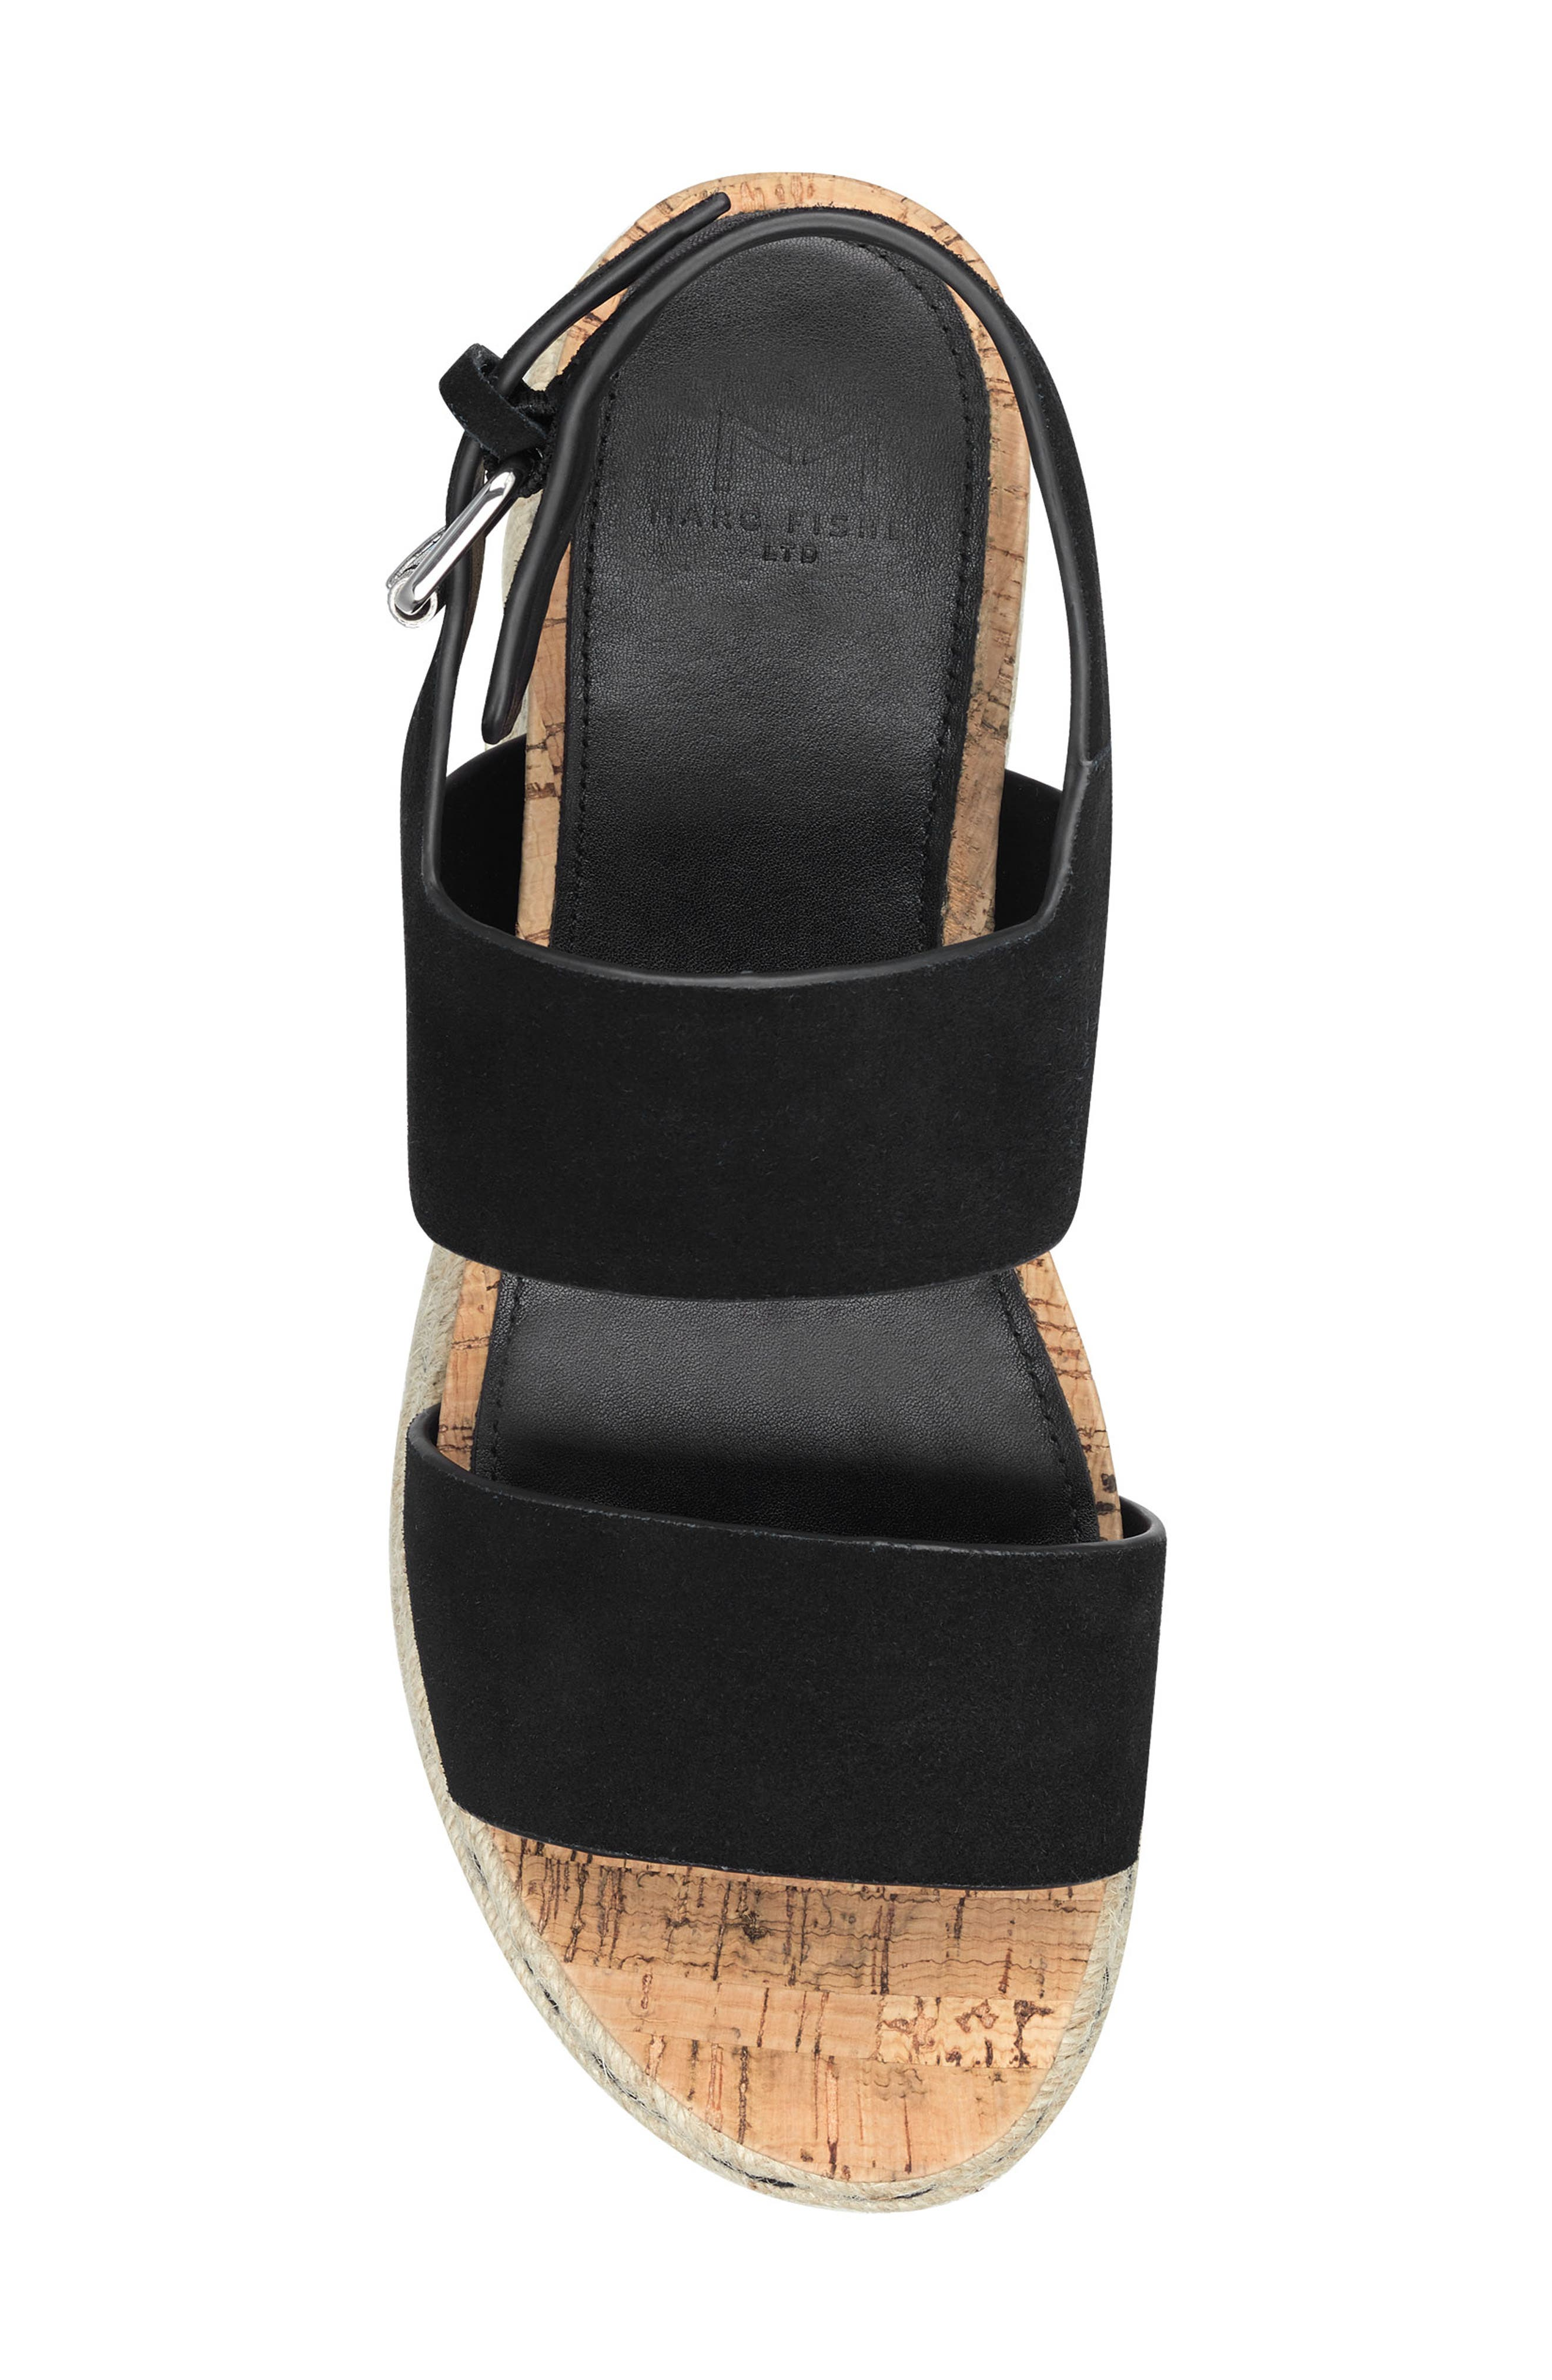 MARC FISHER LTD, Oria Espadrille Platform Sandal, Alternate thumbnail 5, color, BLACK SUEDE